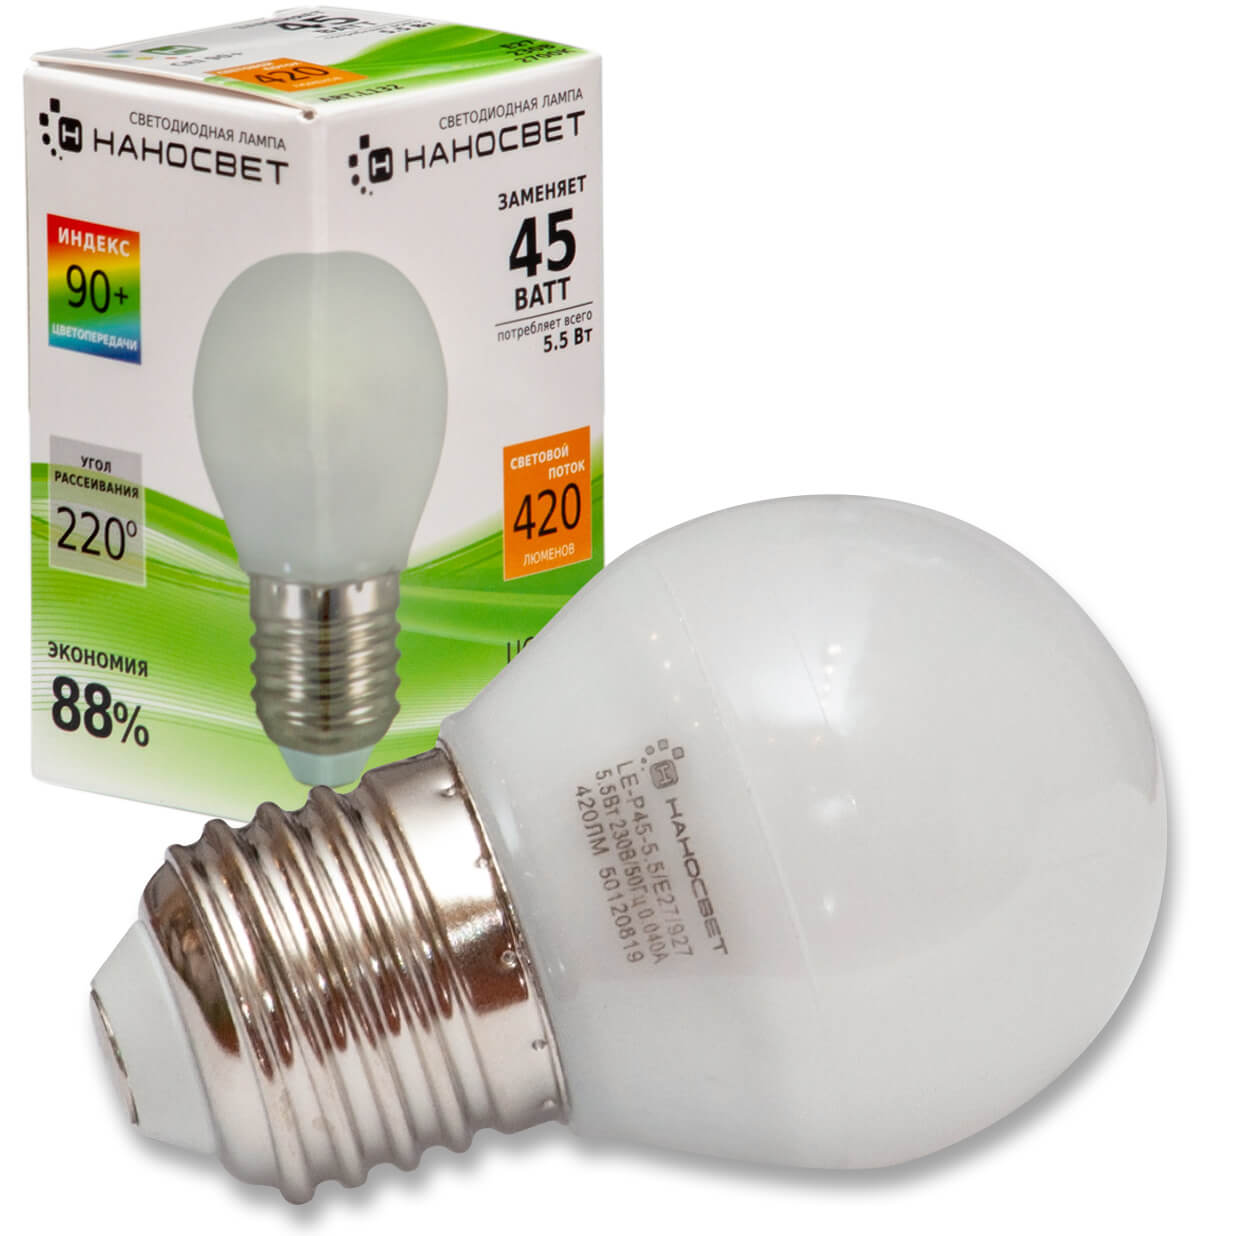 Лампа светодиодная Наносвет E27 6,5W 2700K матовая LE-P45-6.5/E27/827 L132 лампа светодиодная e27 6w 2700k свеча матовая le cd 6 e27 827 l252